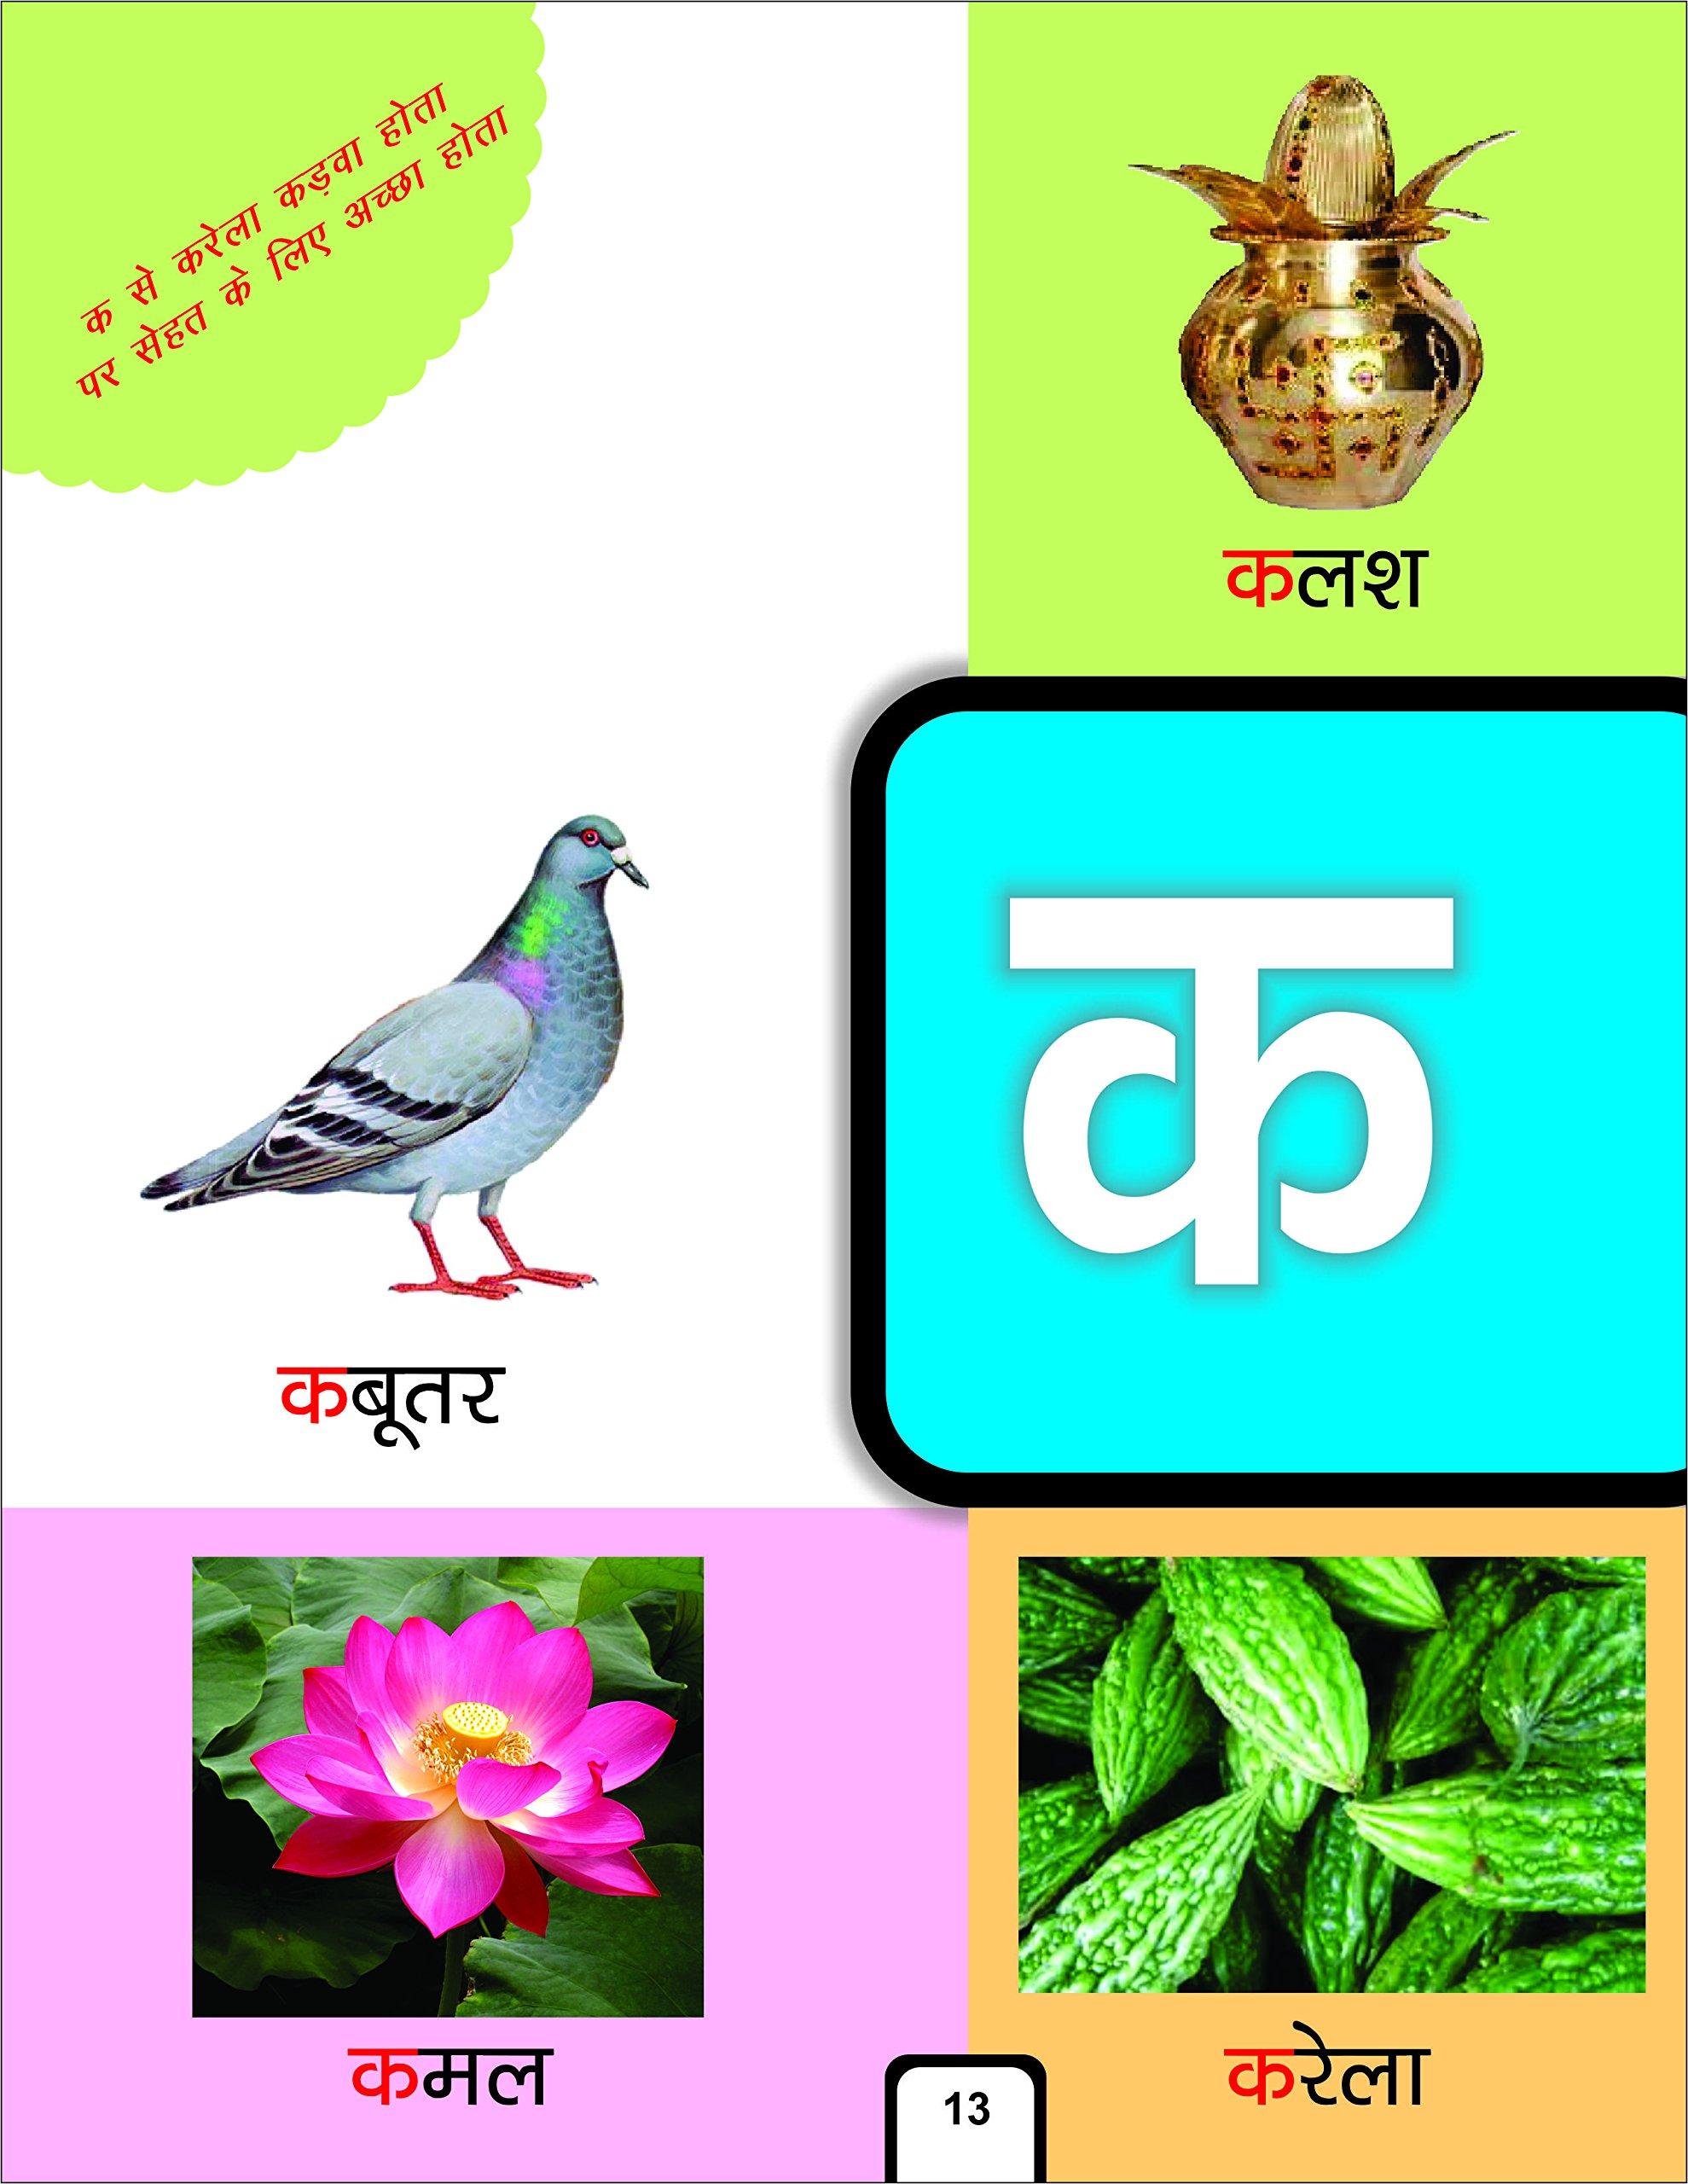 Read Hindi 4 letter words Hindi t Worksheets